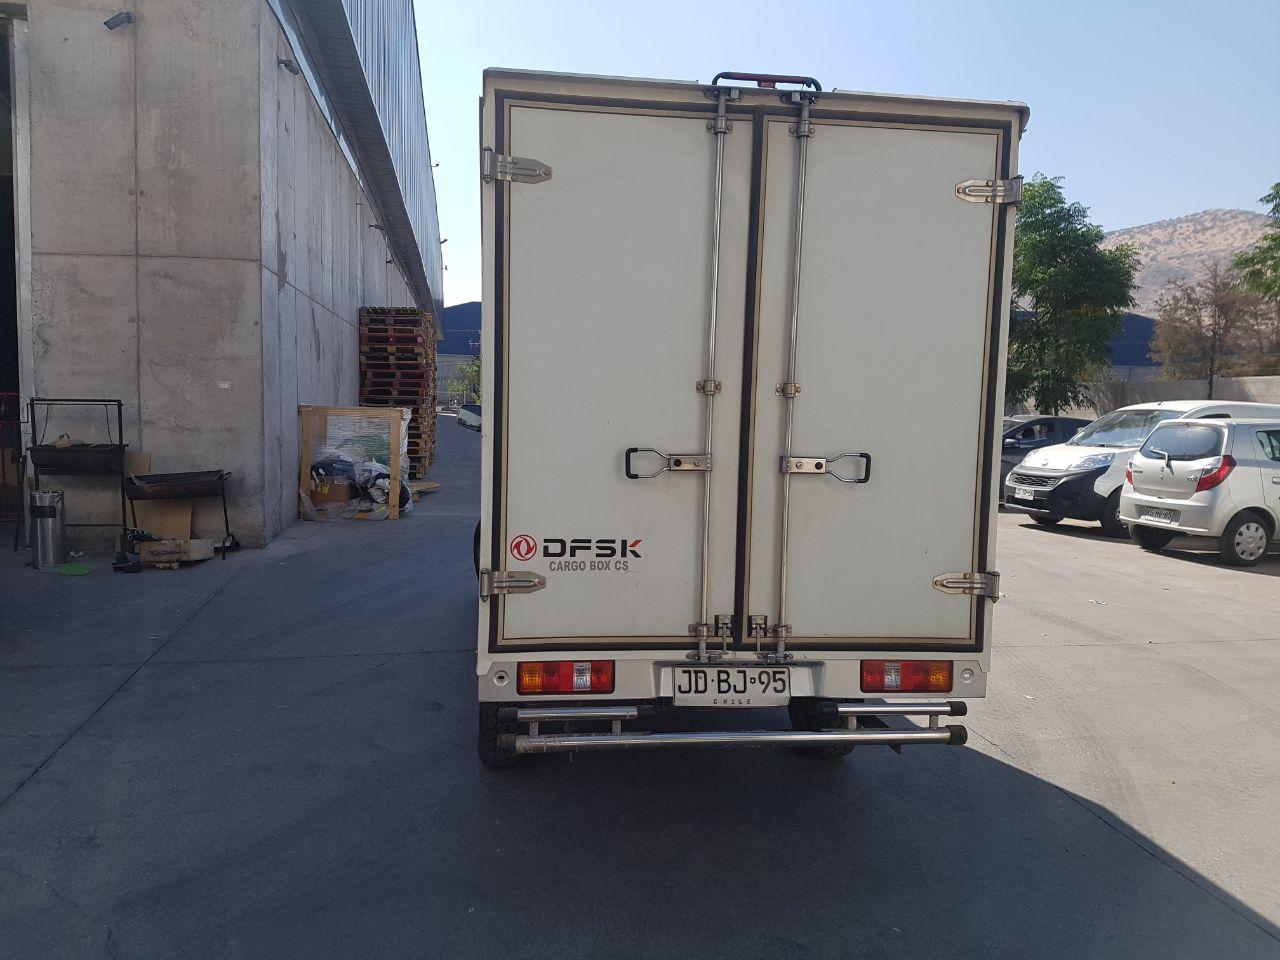 DFSK Cargo Box CS1.3 año 2017